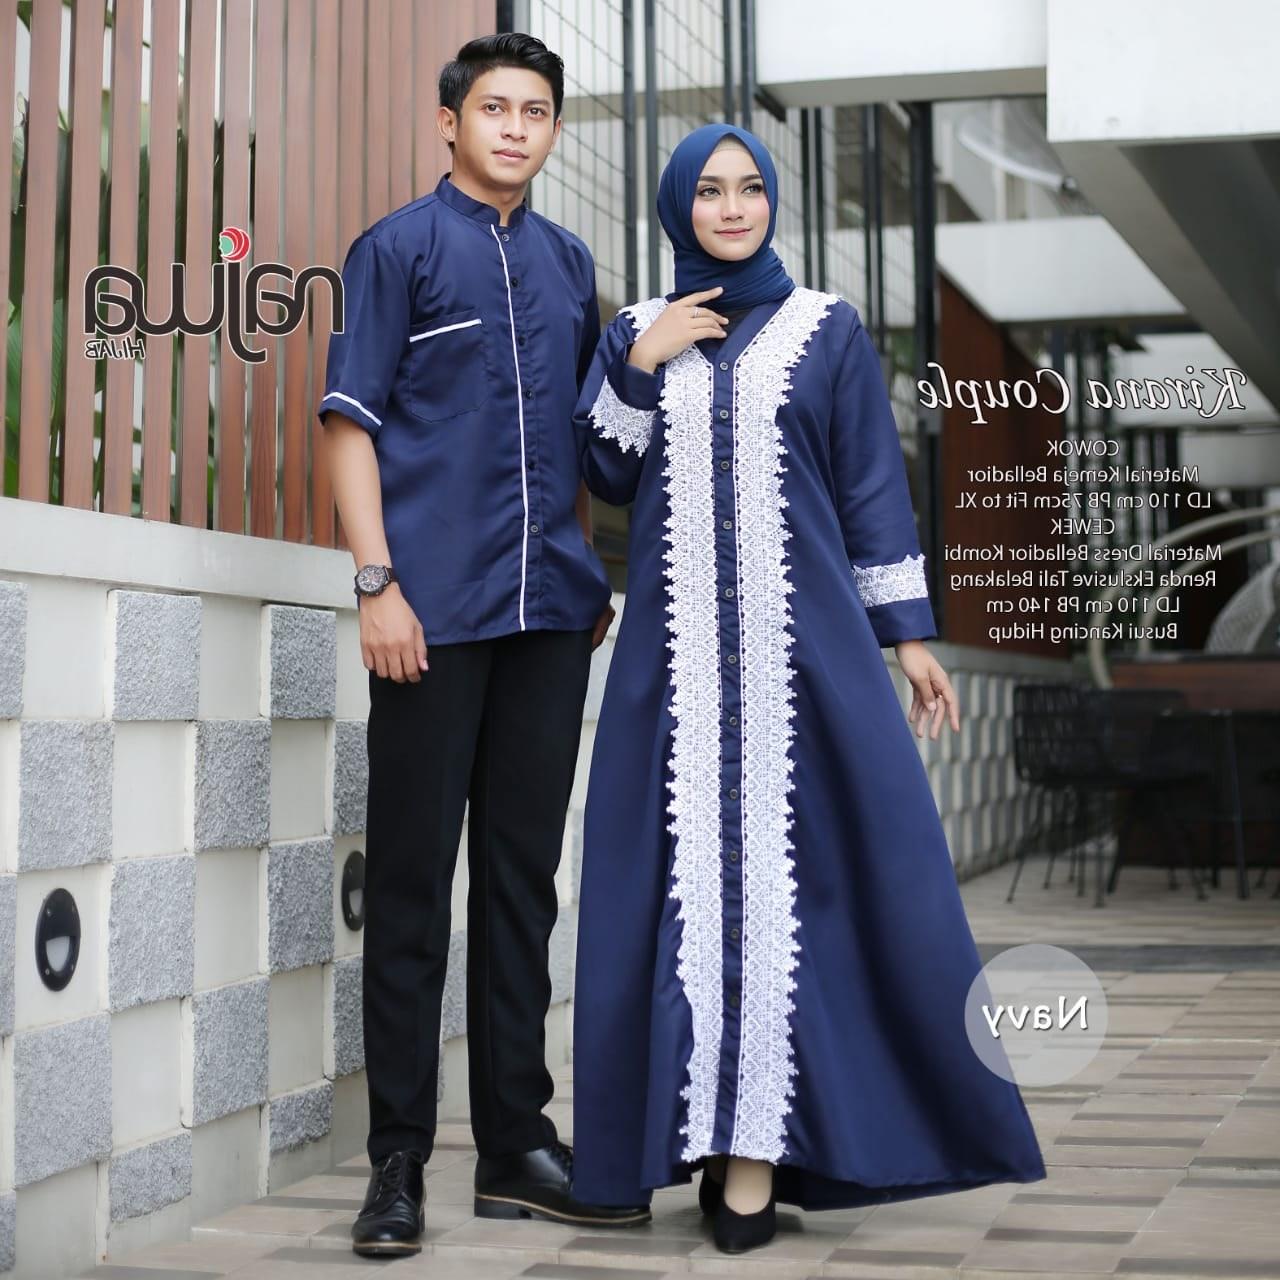 Model Baju Lebaran Pasangan Dddy Baju Lebaran Pasangan Mainmata Studio